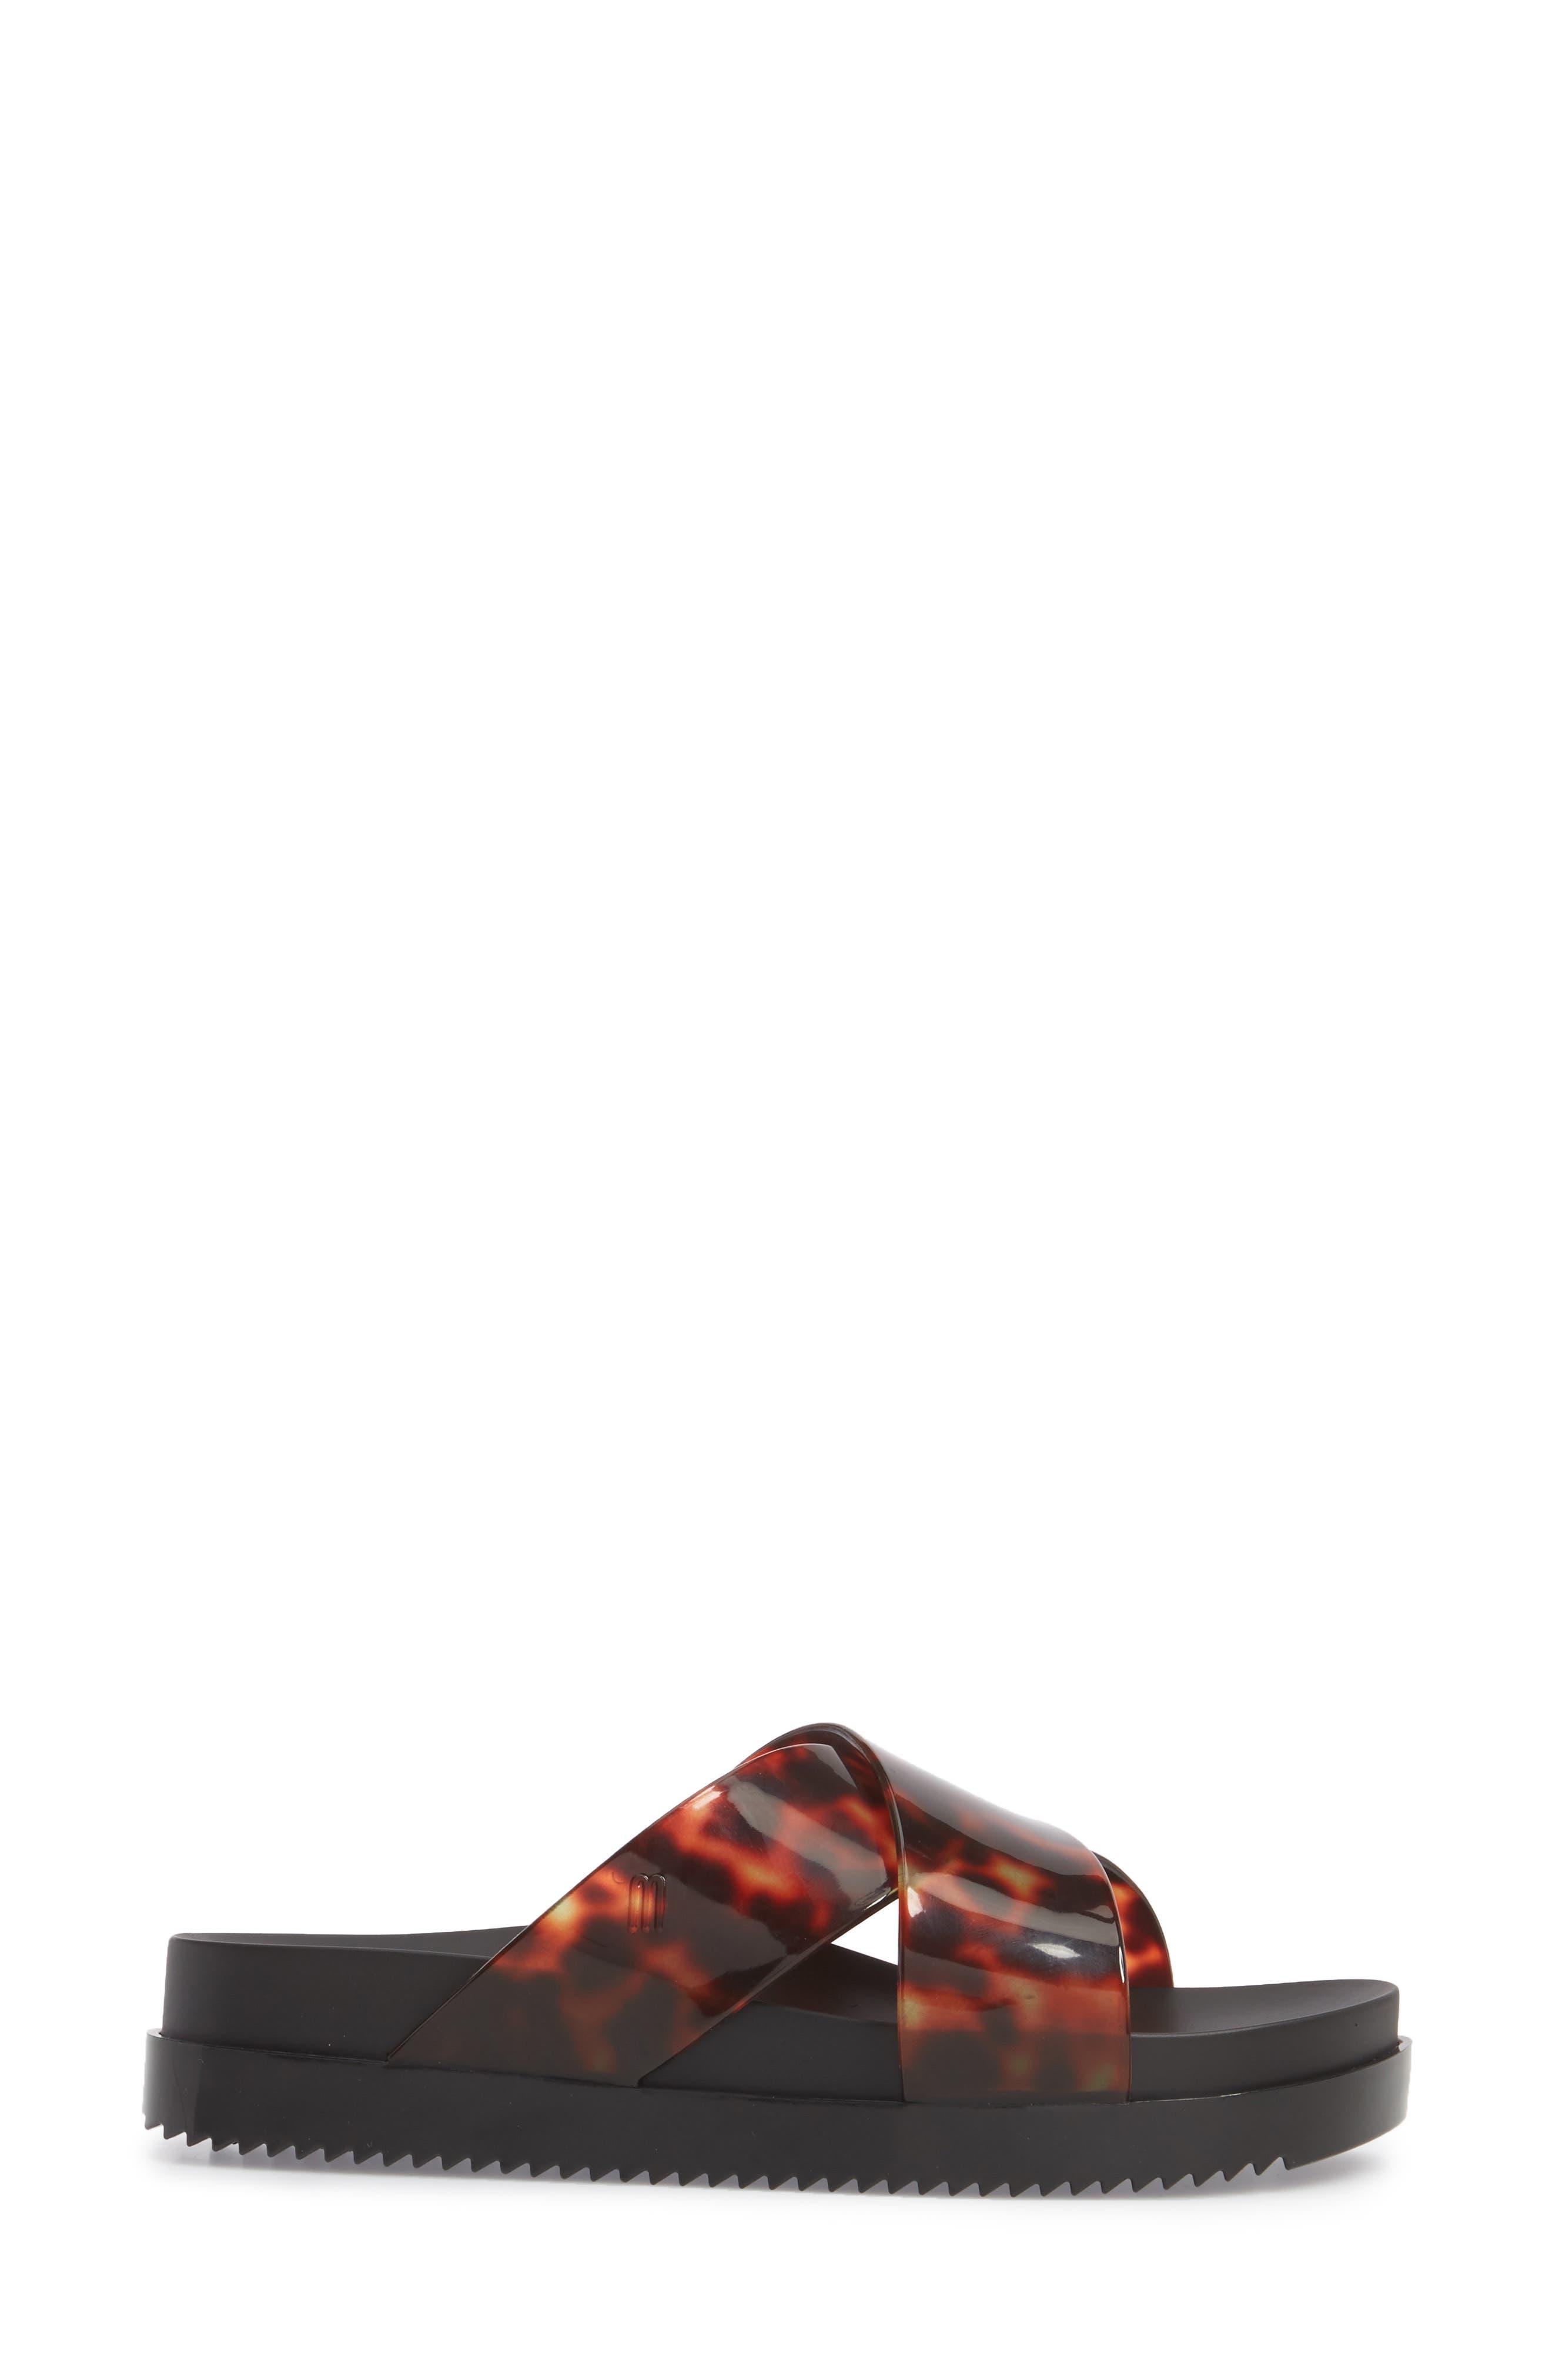 Cosmic II Sandal,                             Alternate thumbnail 3, color,                             200